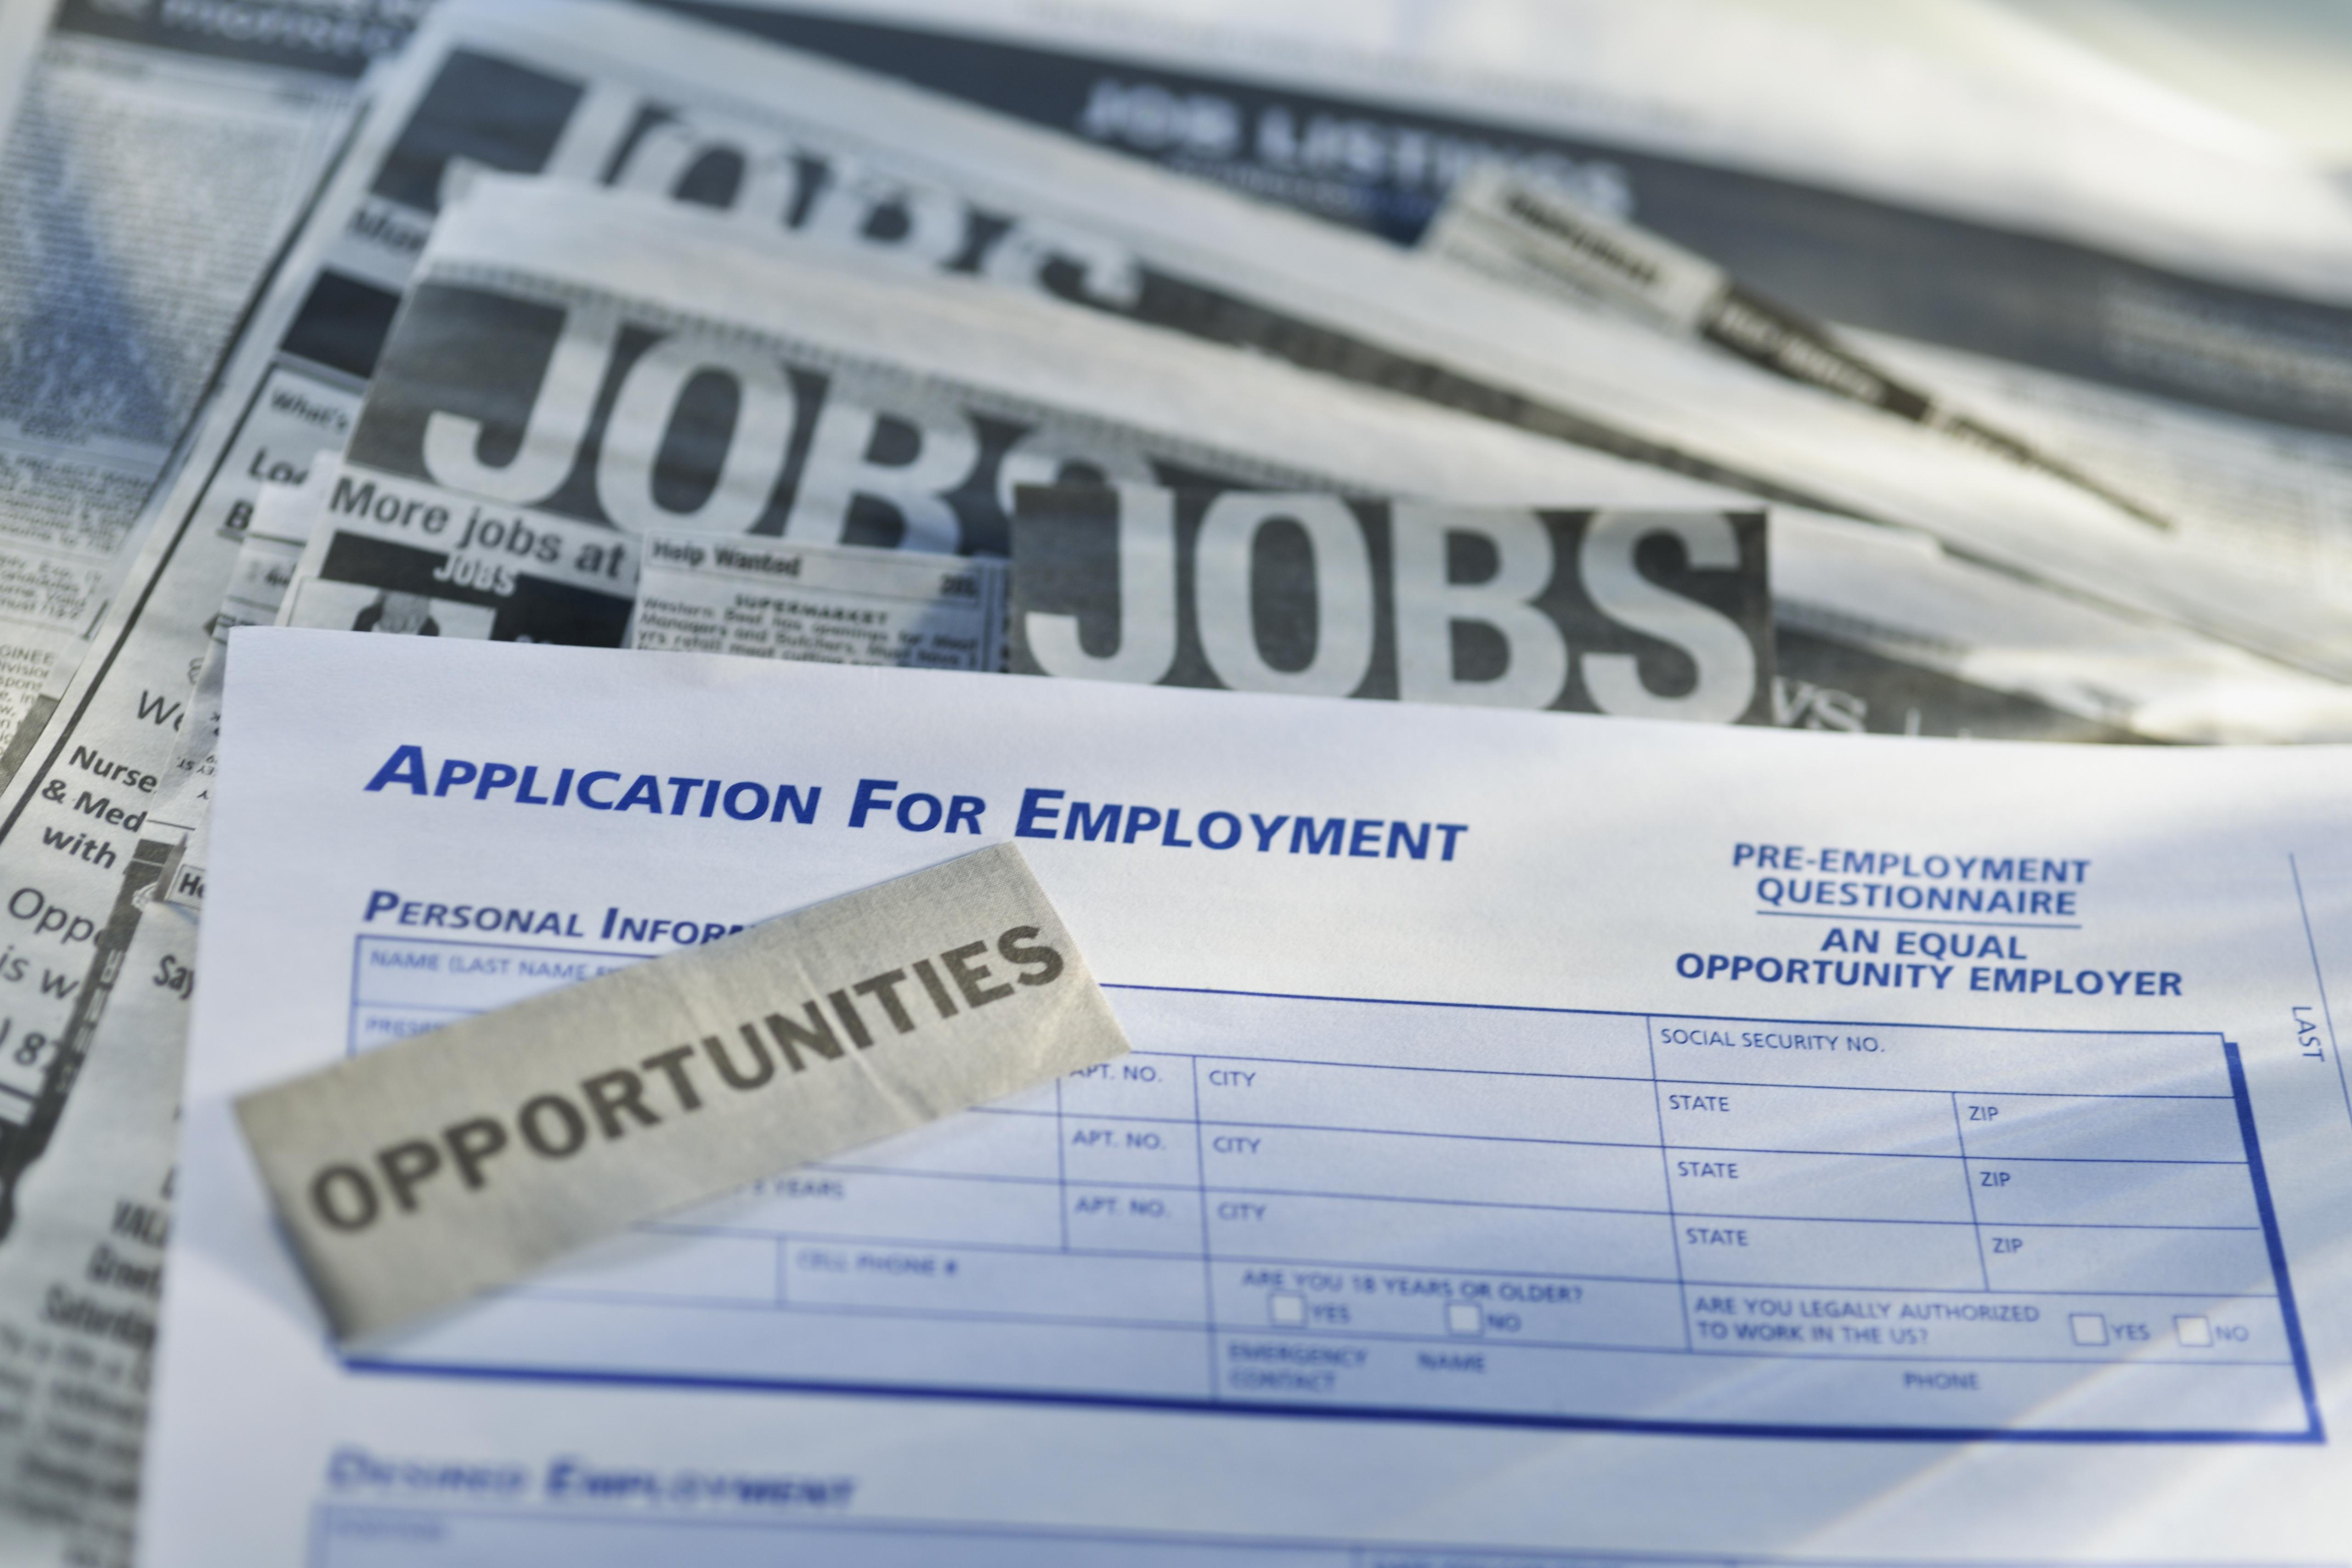 Job listings and application